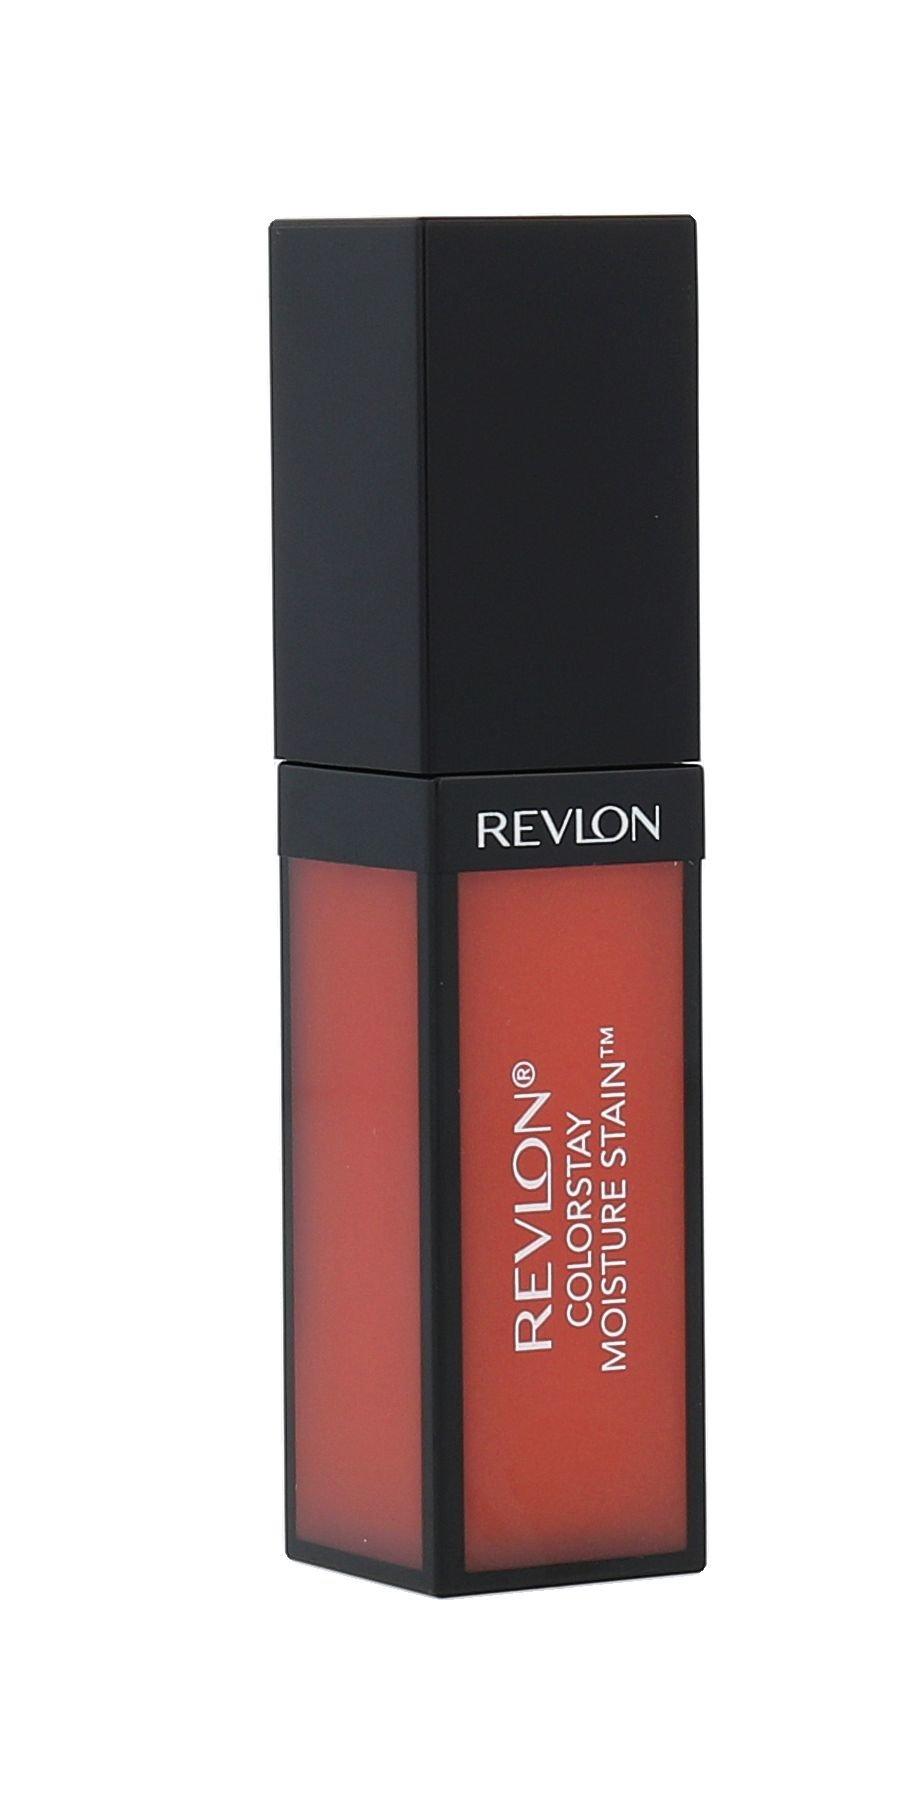 Revlon Colorstay Cosmetic 8ml 050 London Posh